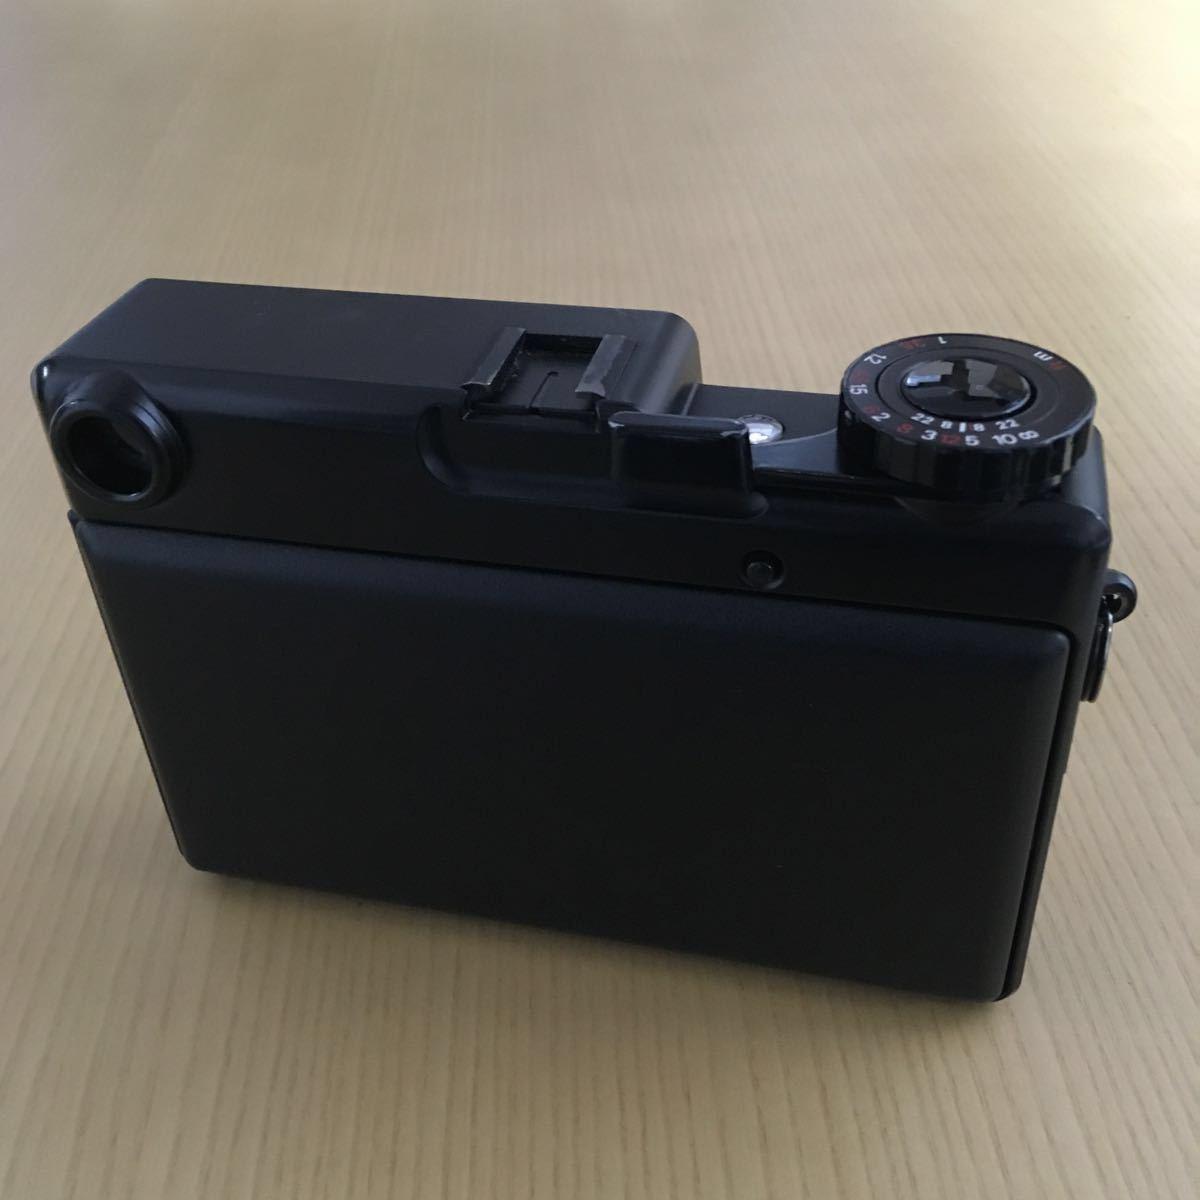 PLAUBEL makina 67 (Nikon Nikkor 80mm f2.8)プラウベル・マキナ 中判カメラ 完動品 シャッター切れスピード変化し露出計も動作しました。_画像5